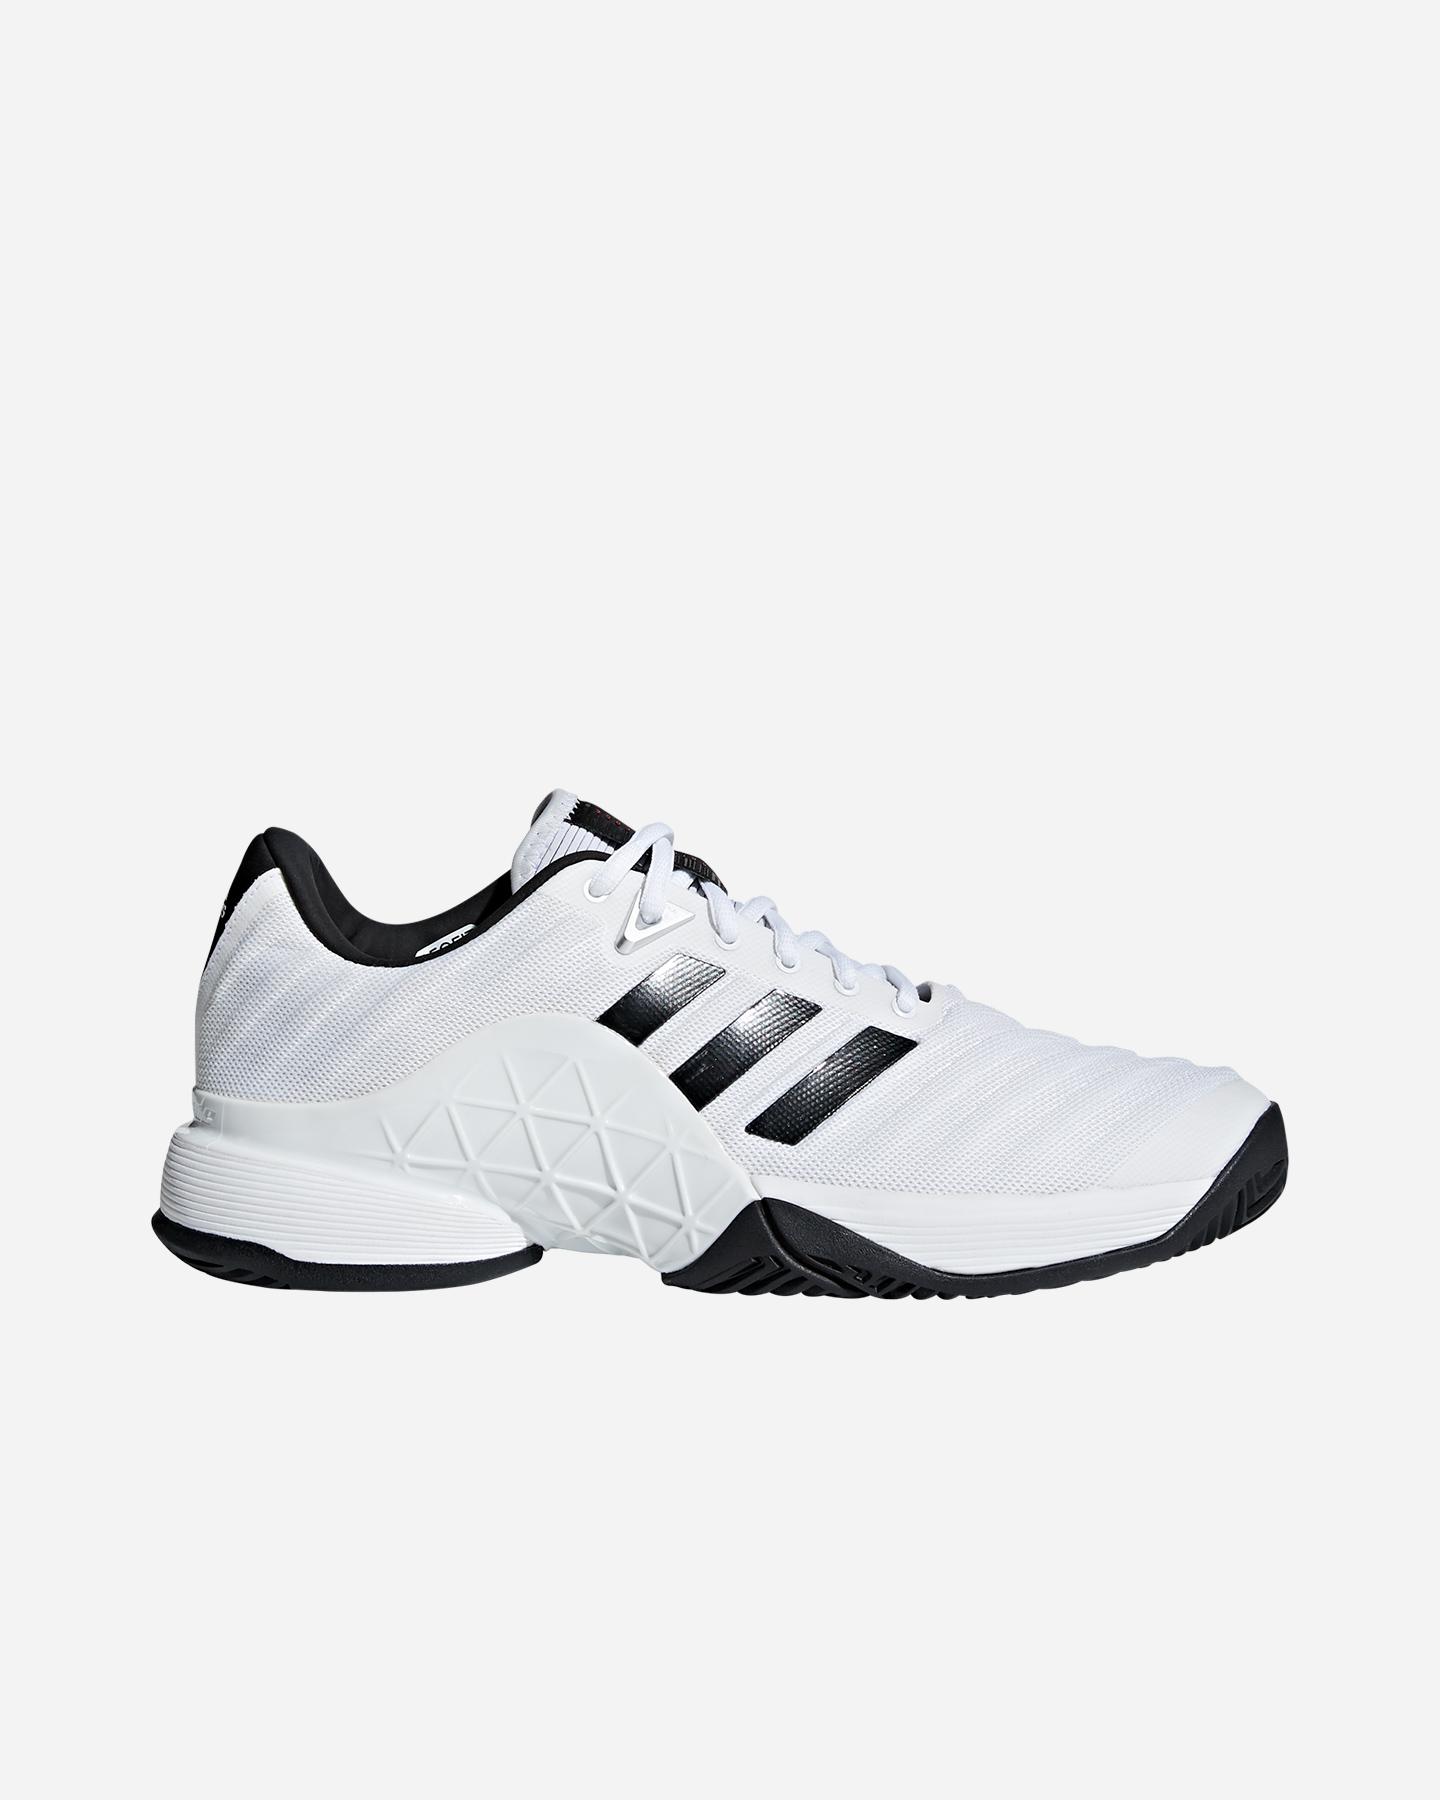 scarpe tennis adidas barricade uomo